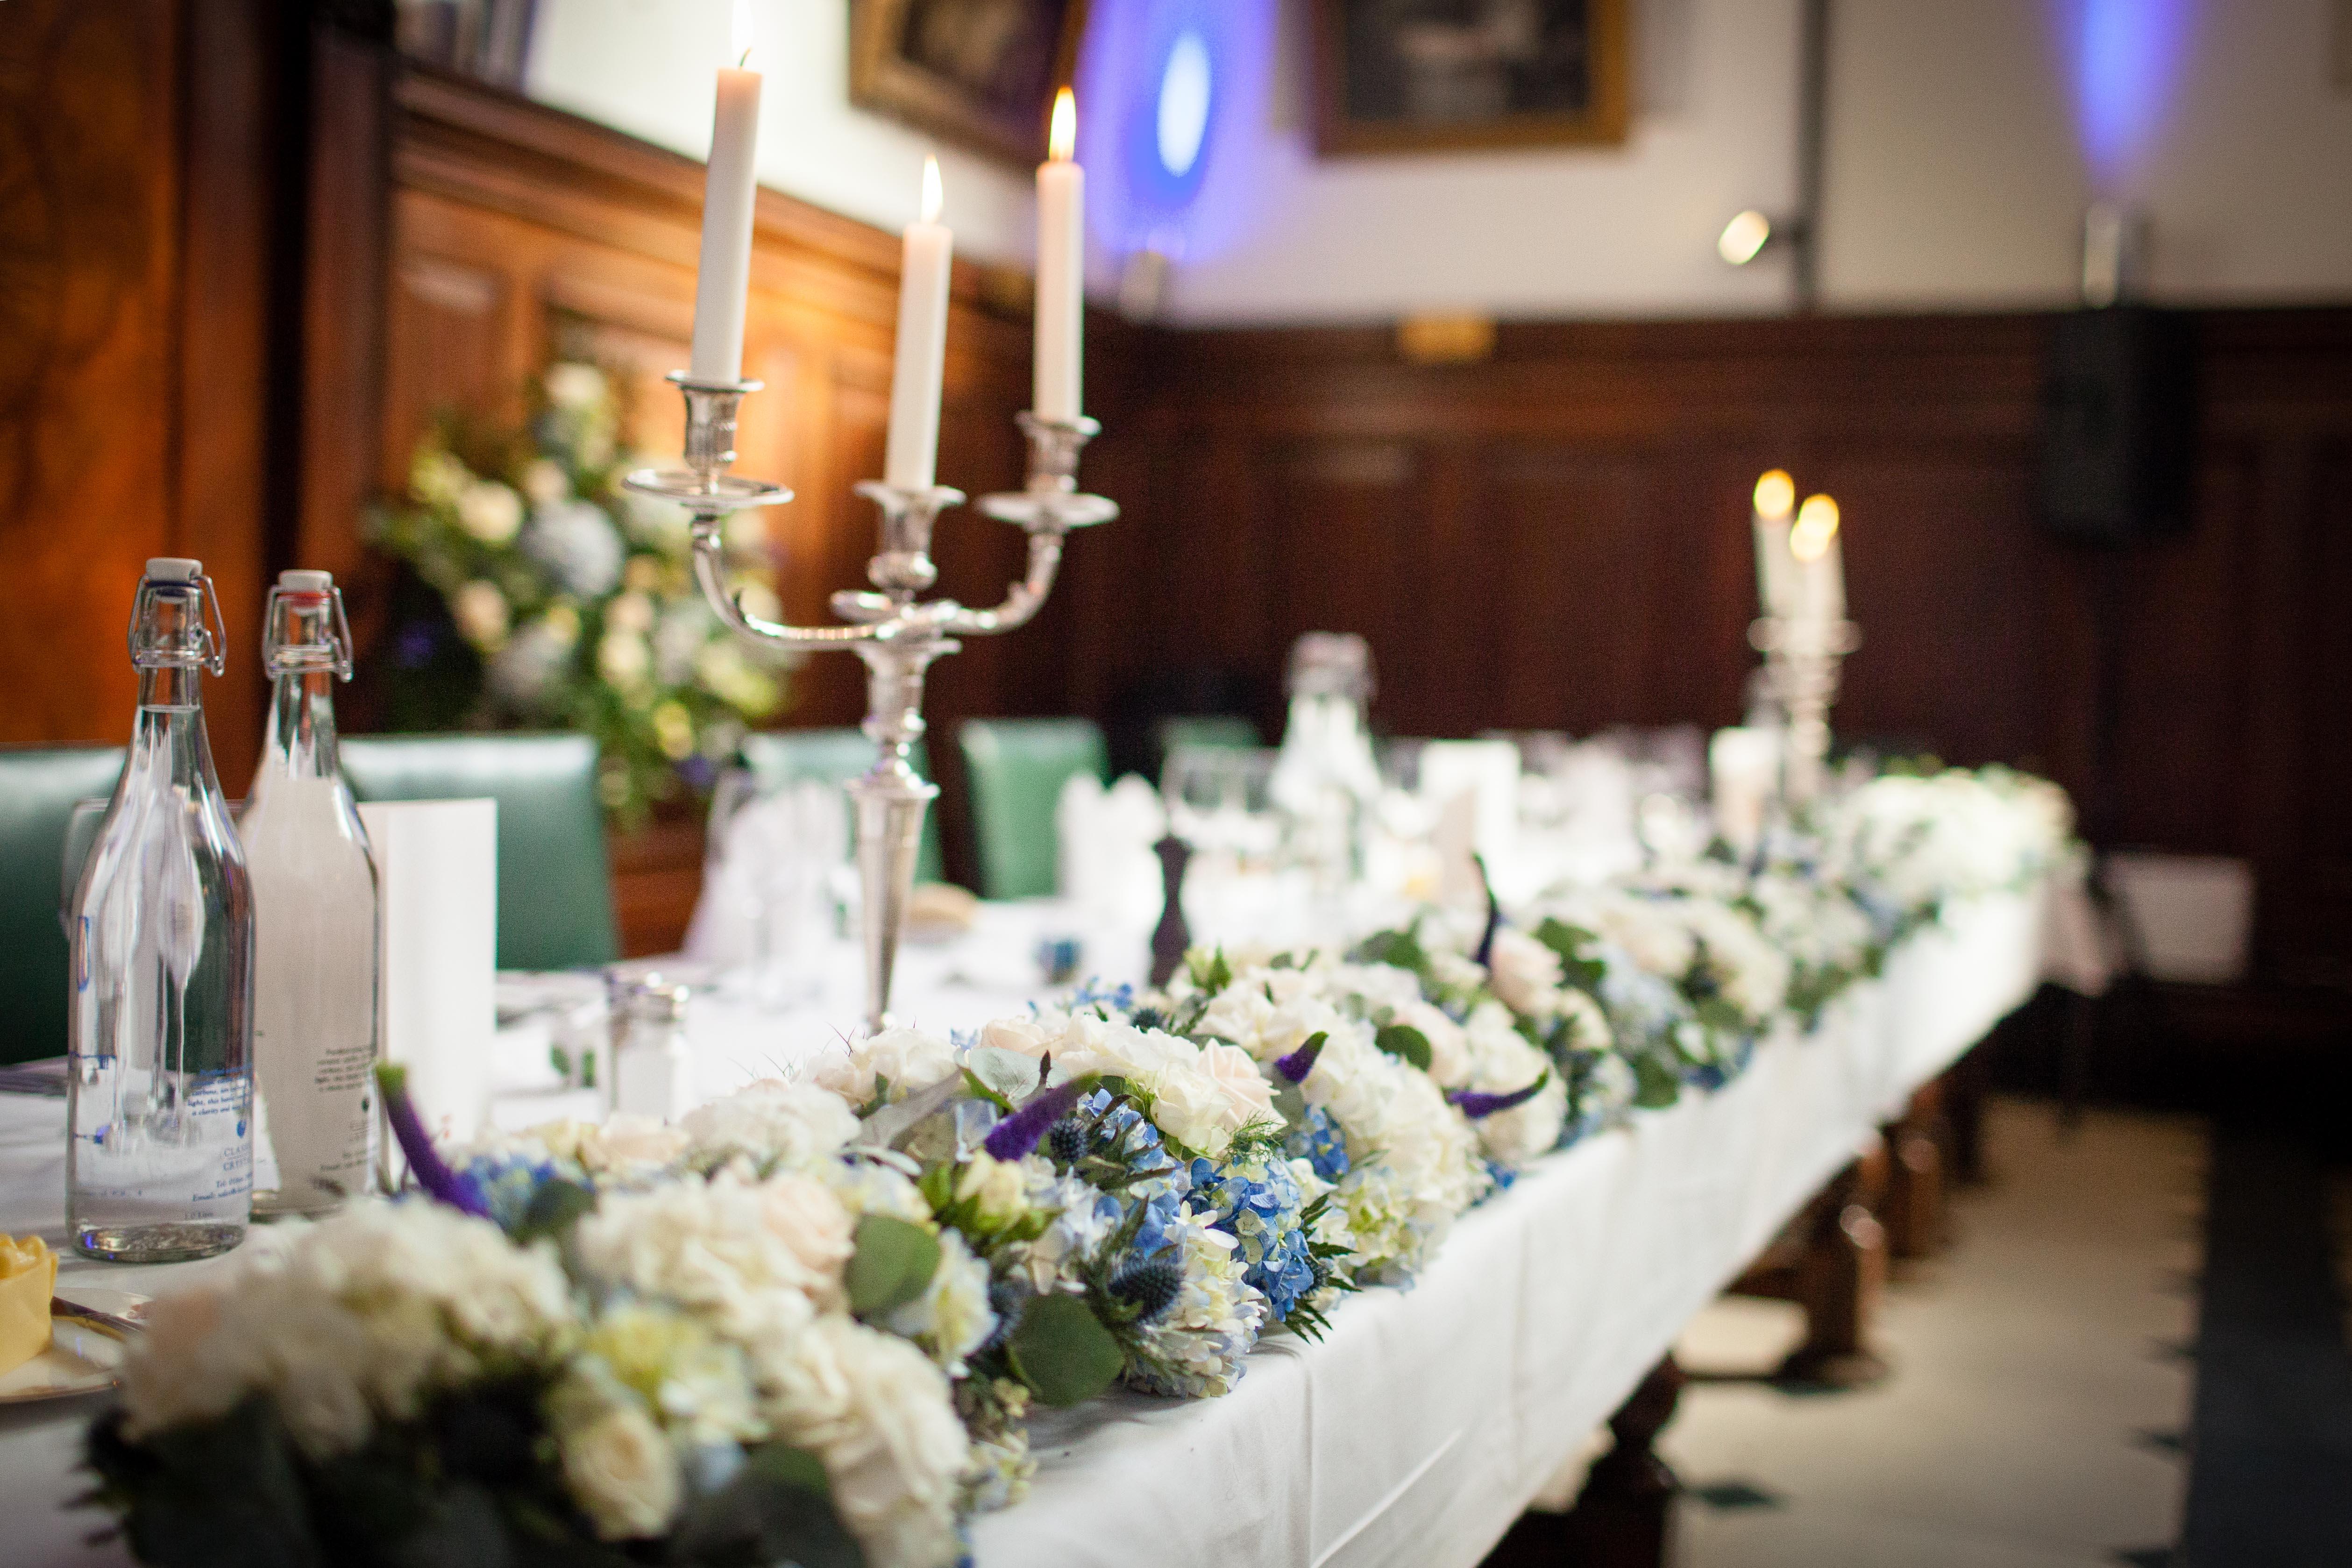 Wedding Flower Table Runner Queen's College Oxford Joanna Carter Wedding Flowers Oxford Oxfordshire Buckinghamshire Berkshire London